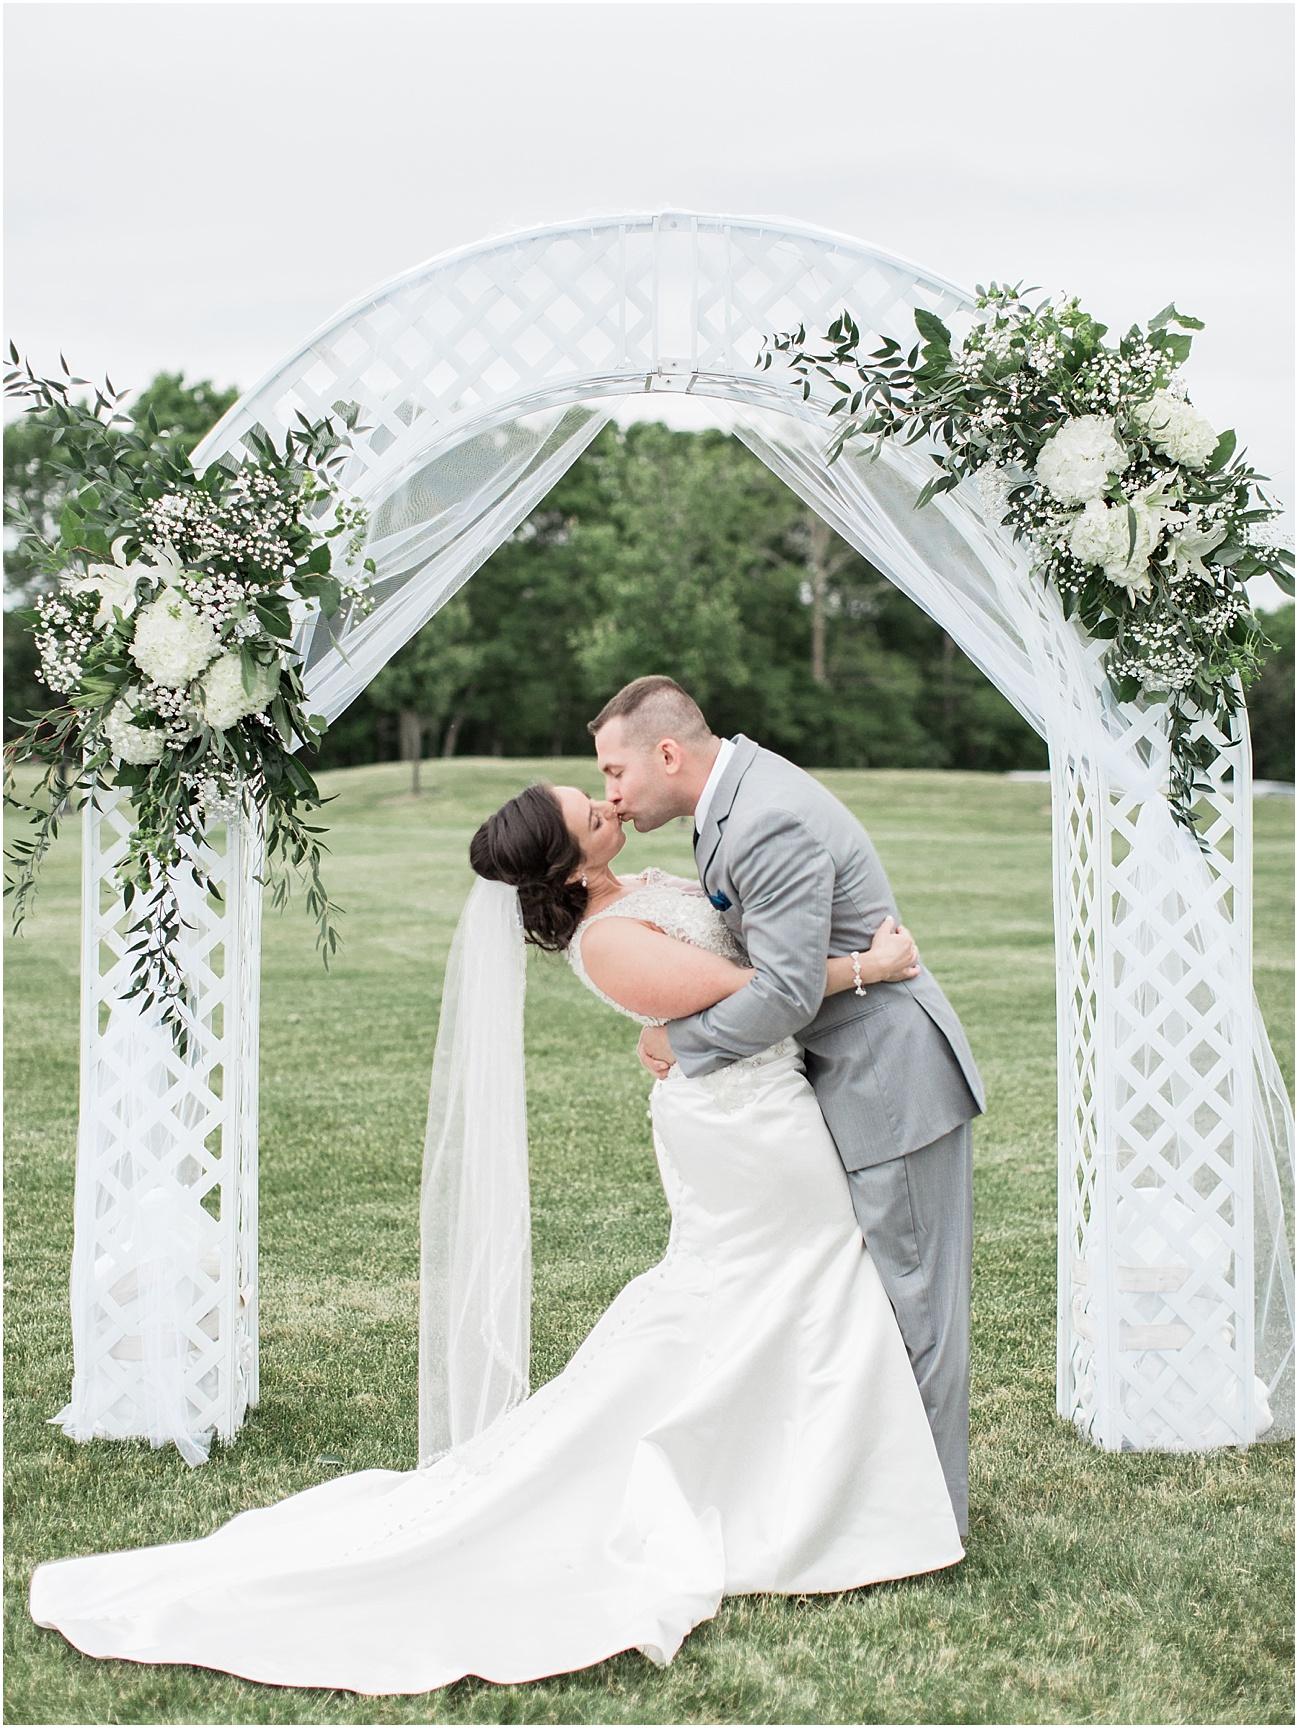 nicole_stephen_cape_club_nicky_falmouth_cod_boston_wedding_photographer_meredith_jane_photography_photo_0192.jpg